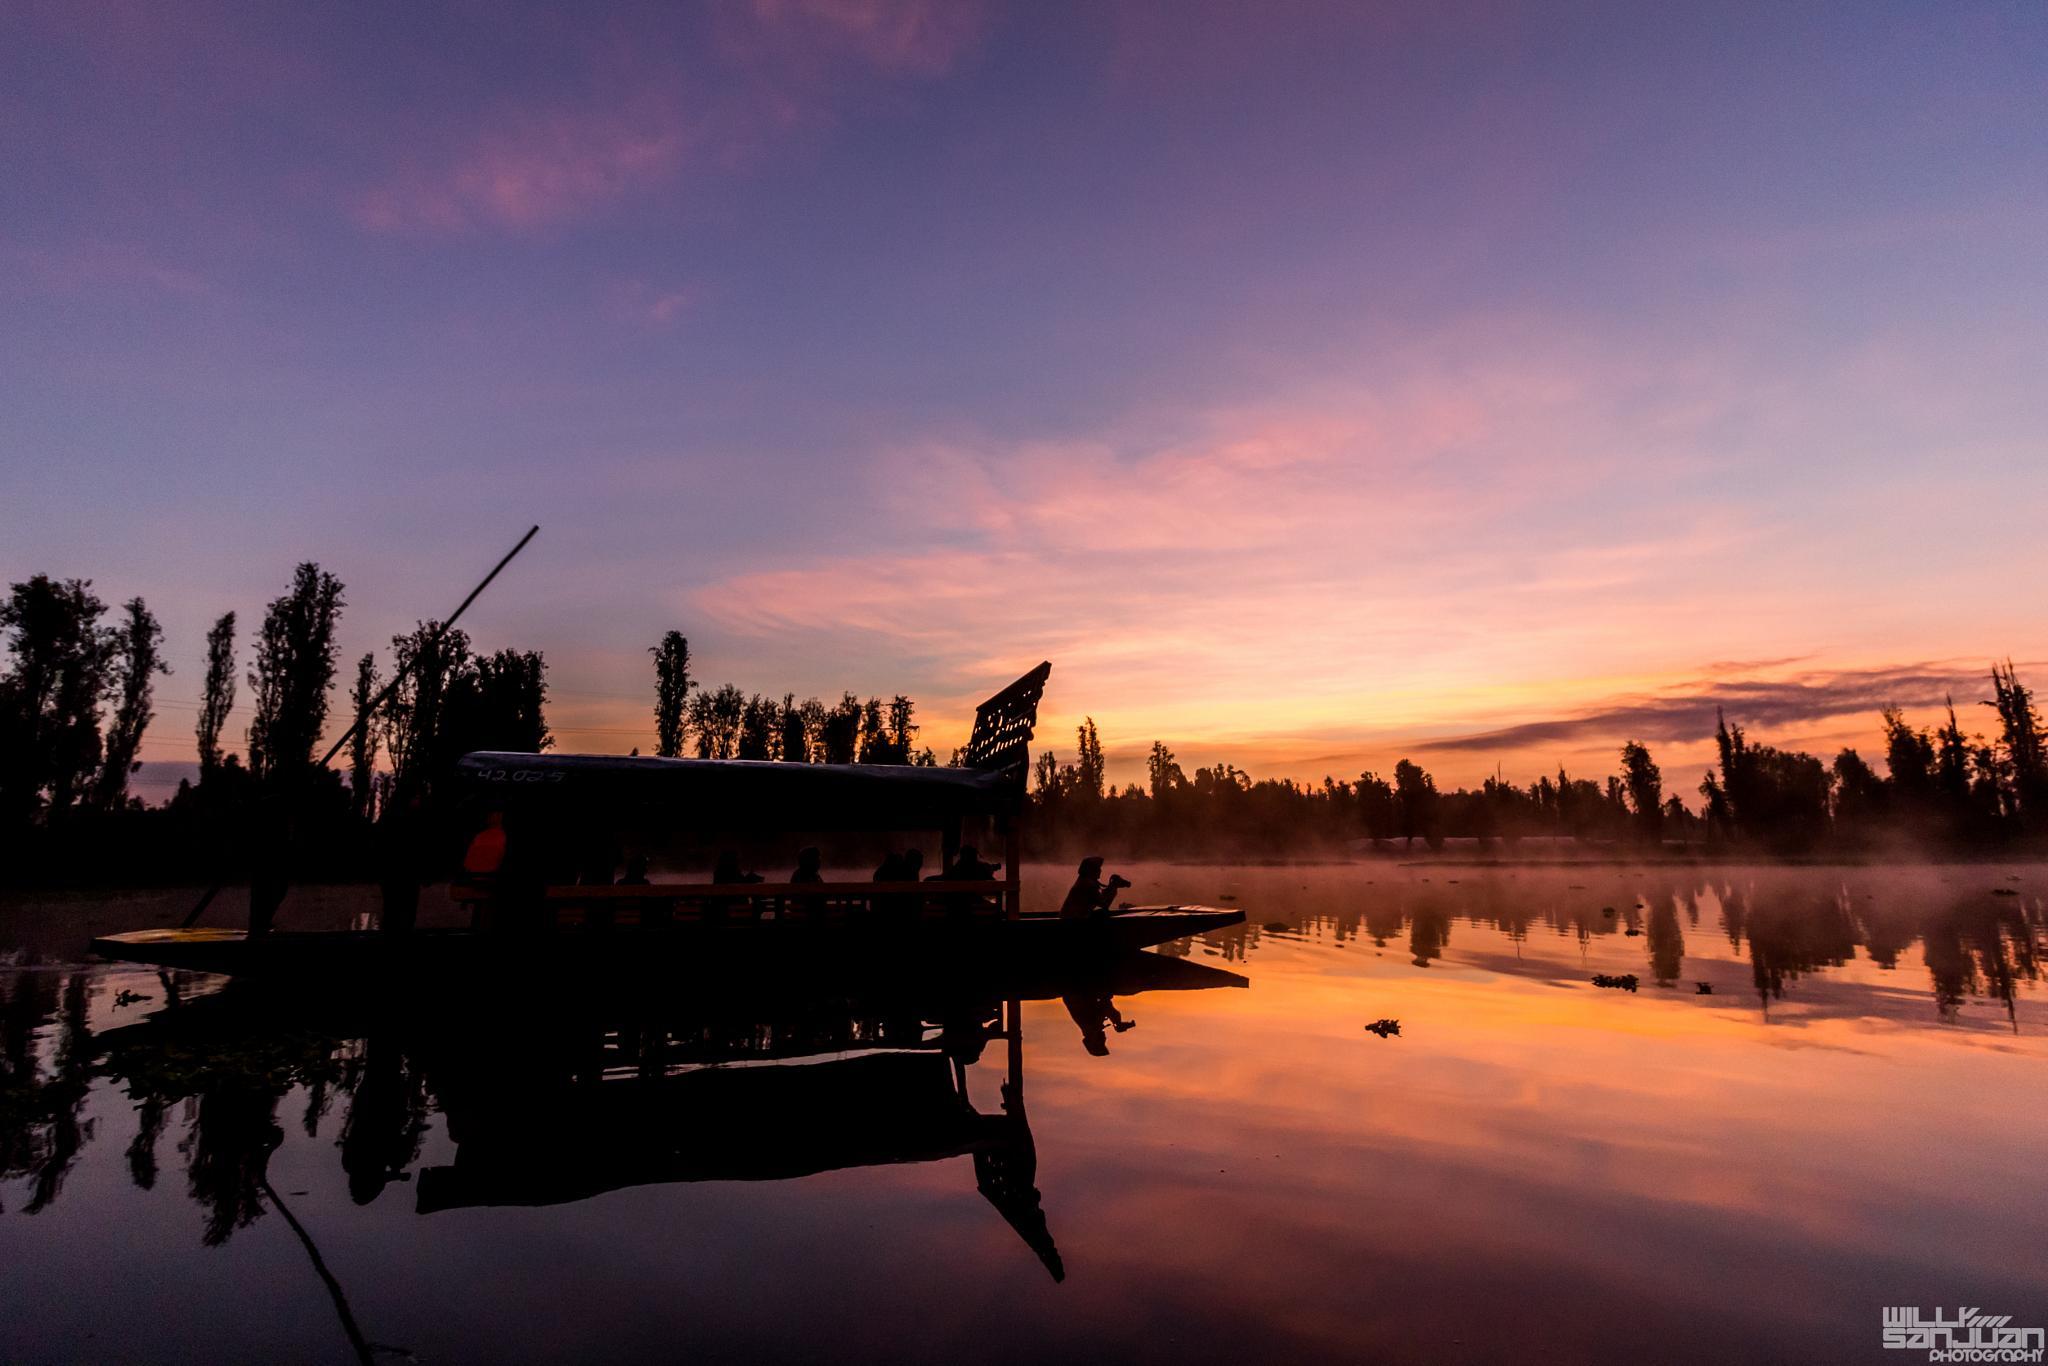 Sunrise in Cuemanco by Willy Sanjuan